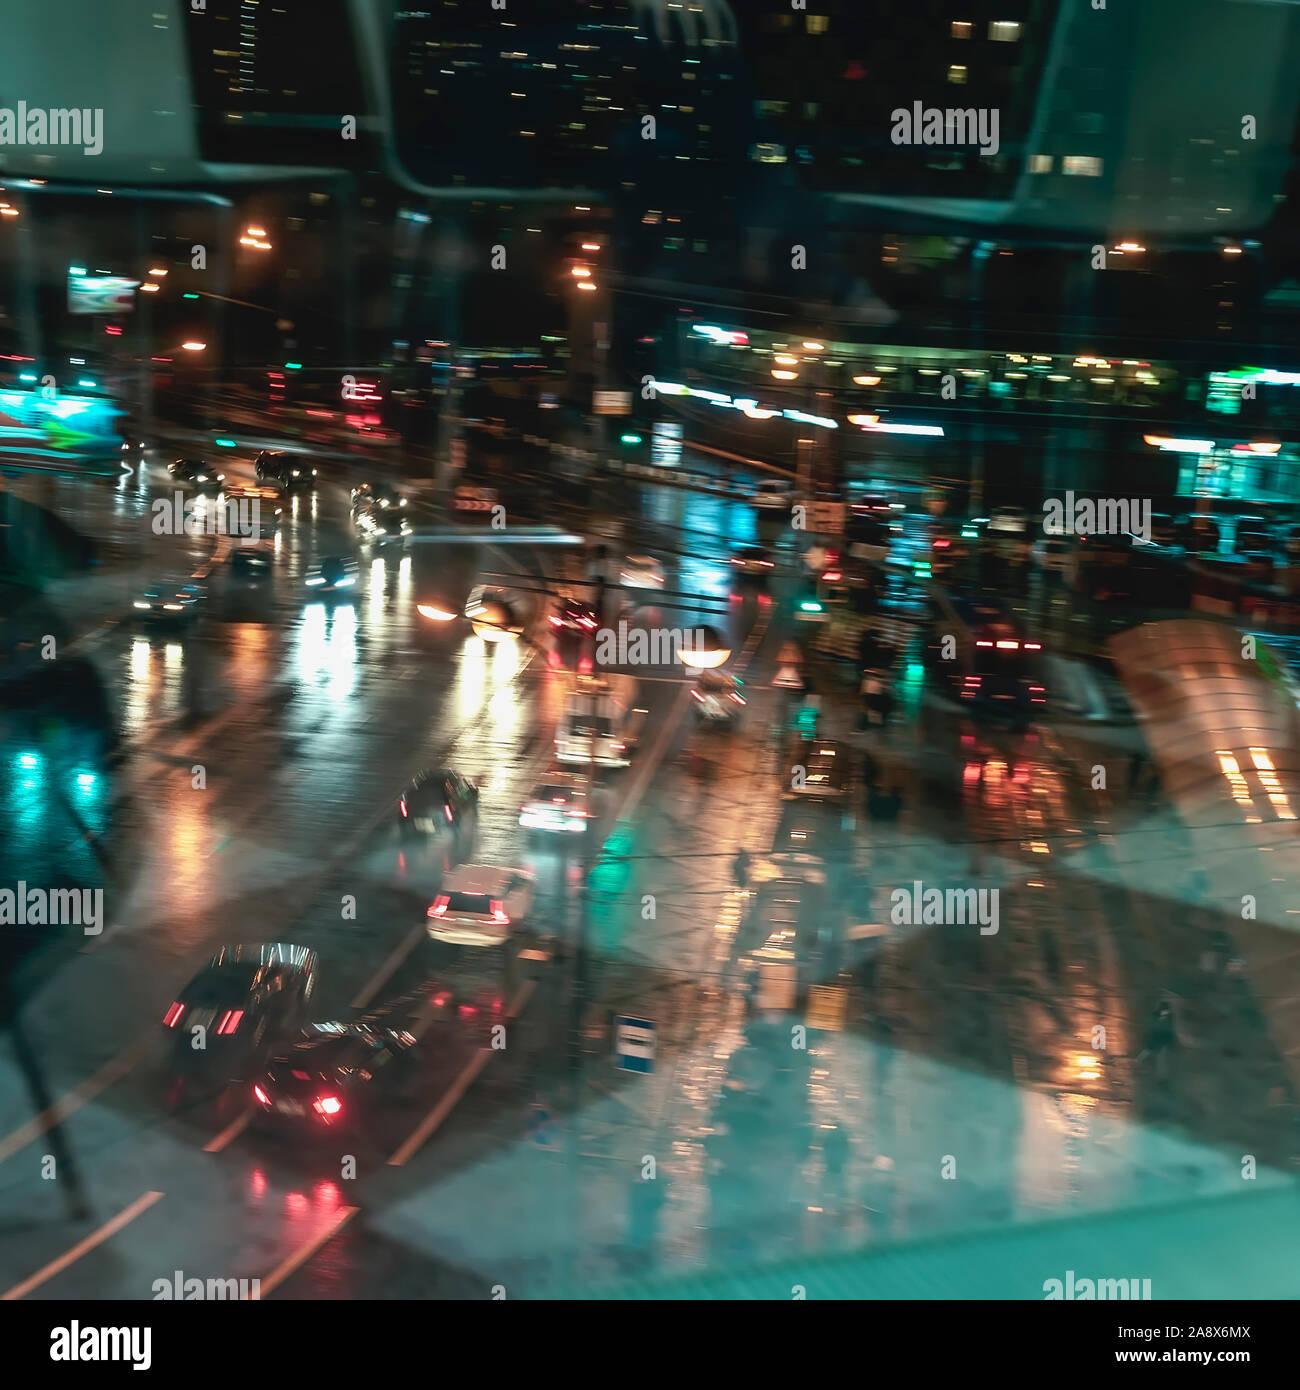 Abstract Blurred Illuminated Street At Rainy Night Traffic